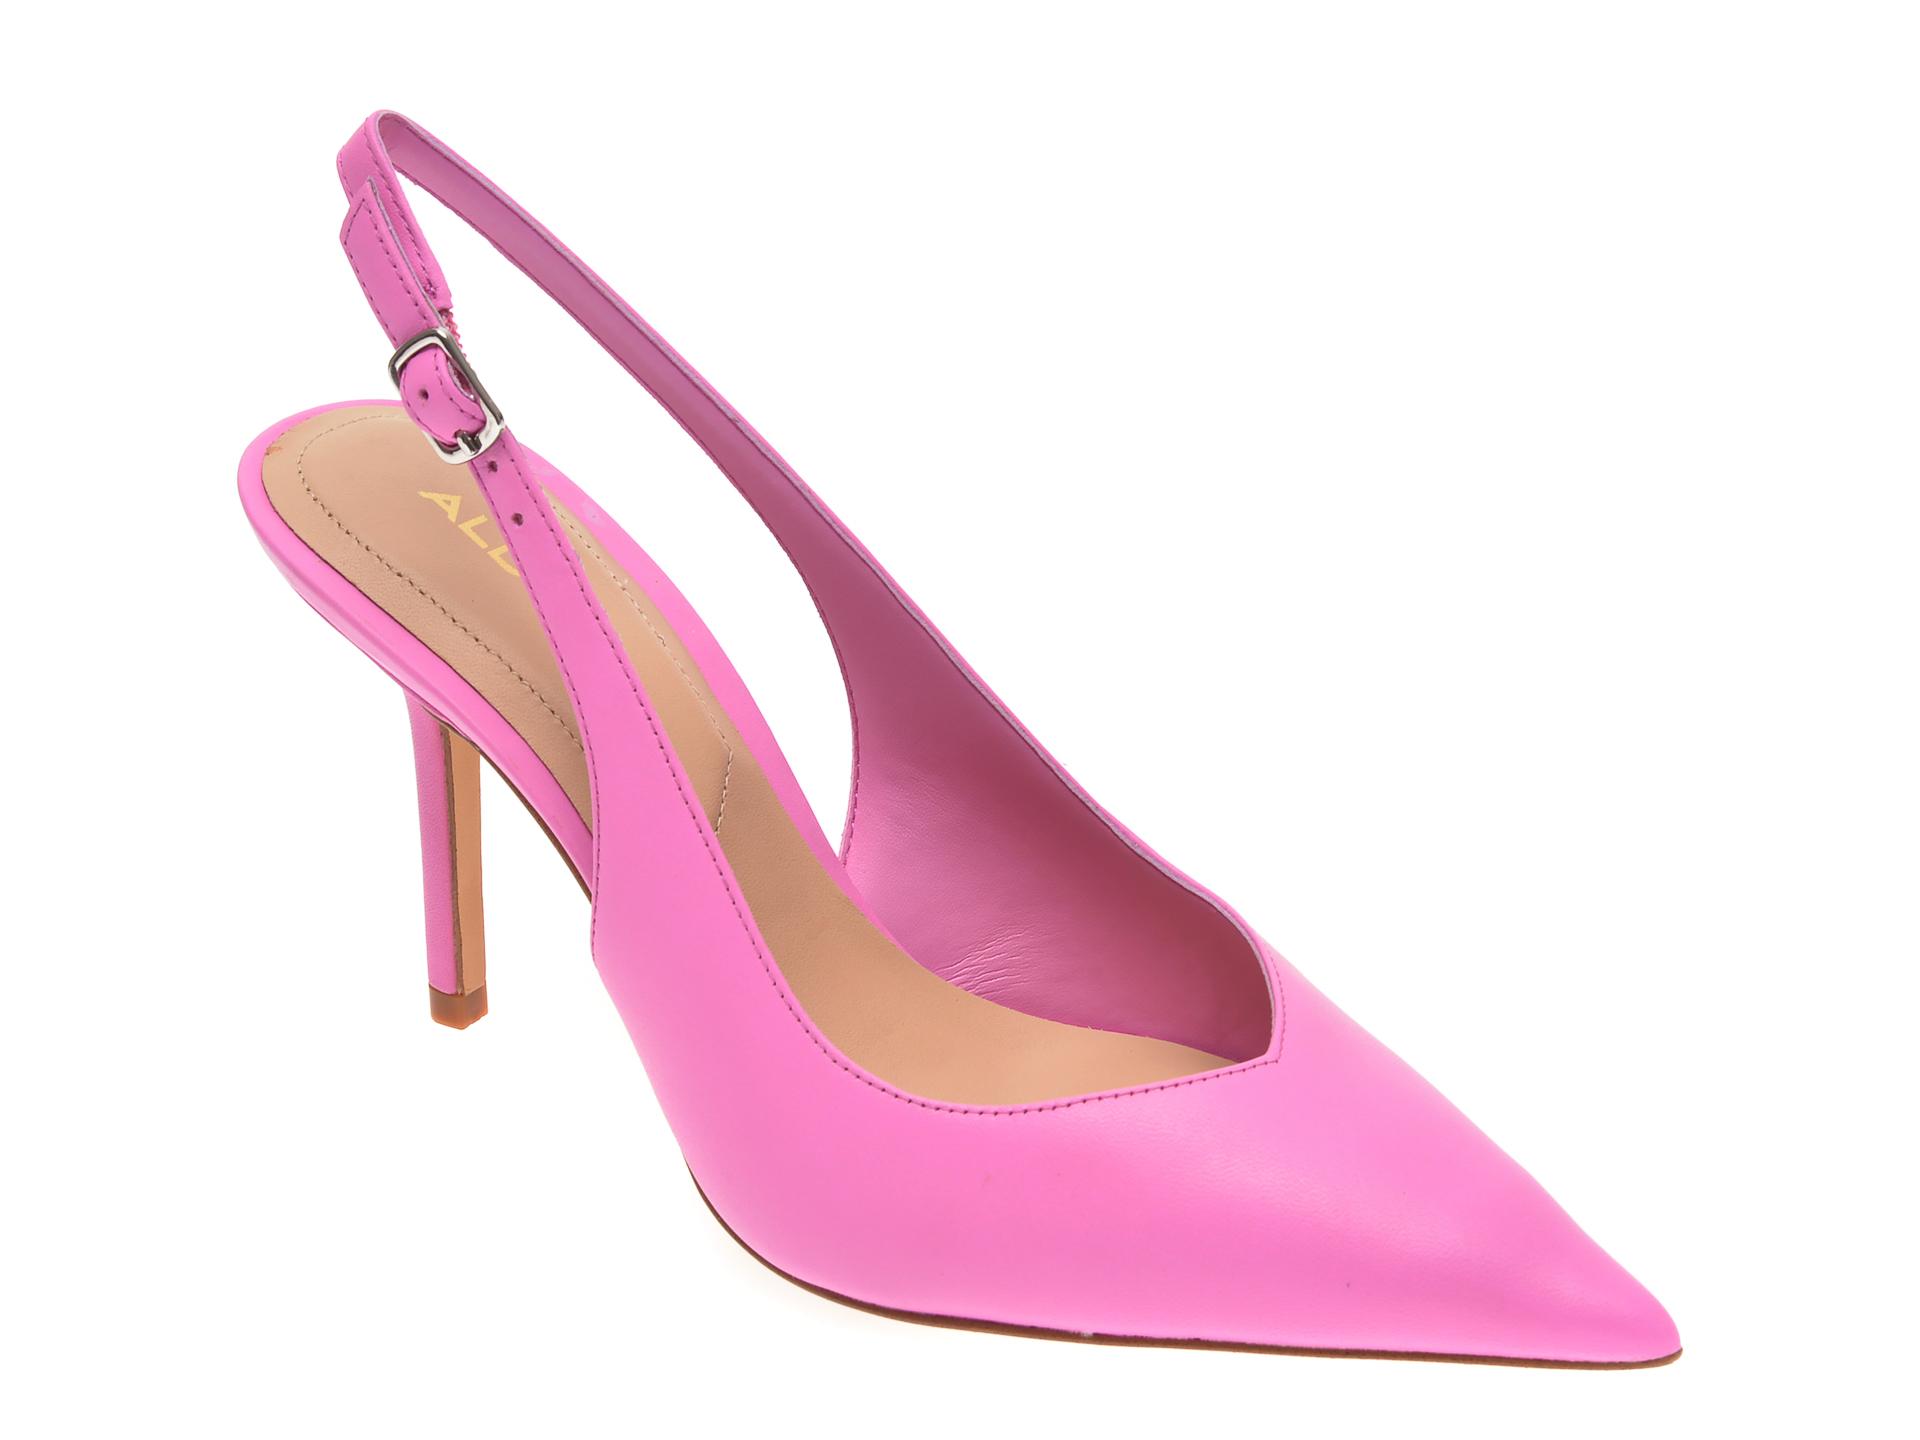 Pantofi ALDO roz, Julietta680, din piele naturala imagine otter.ro